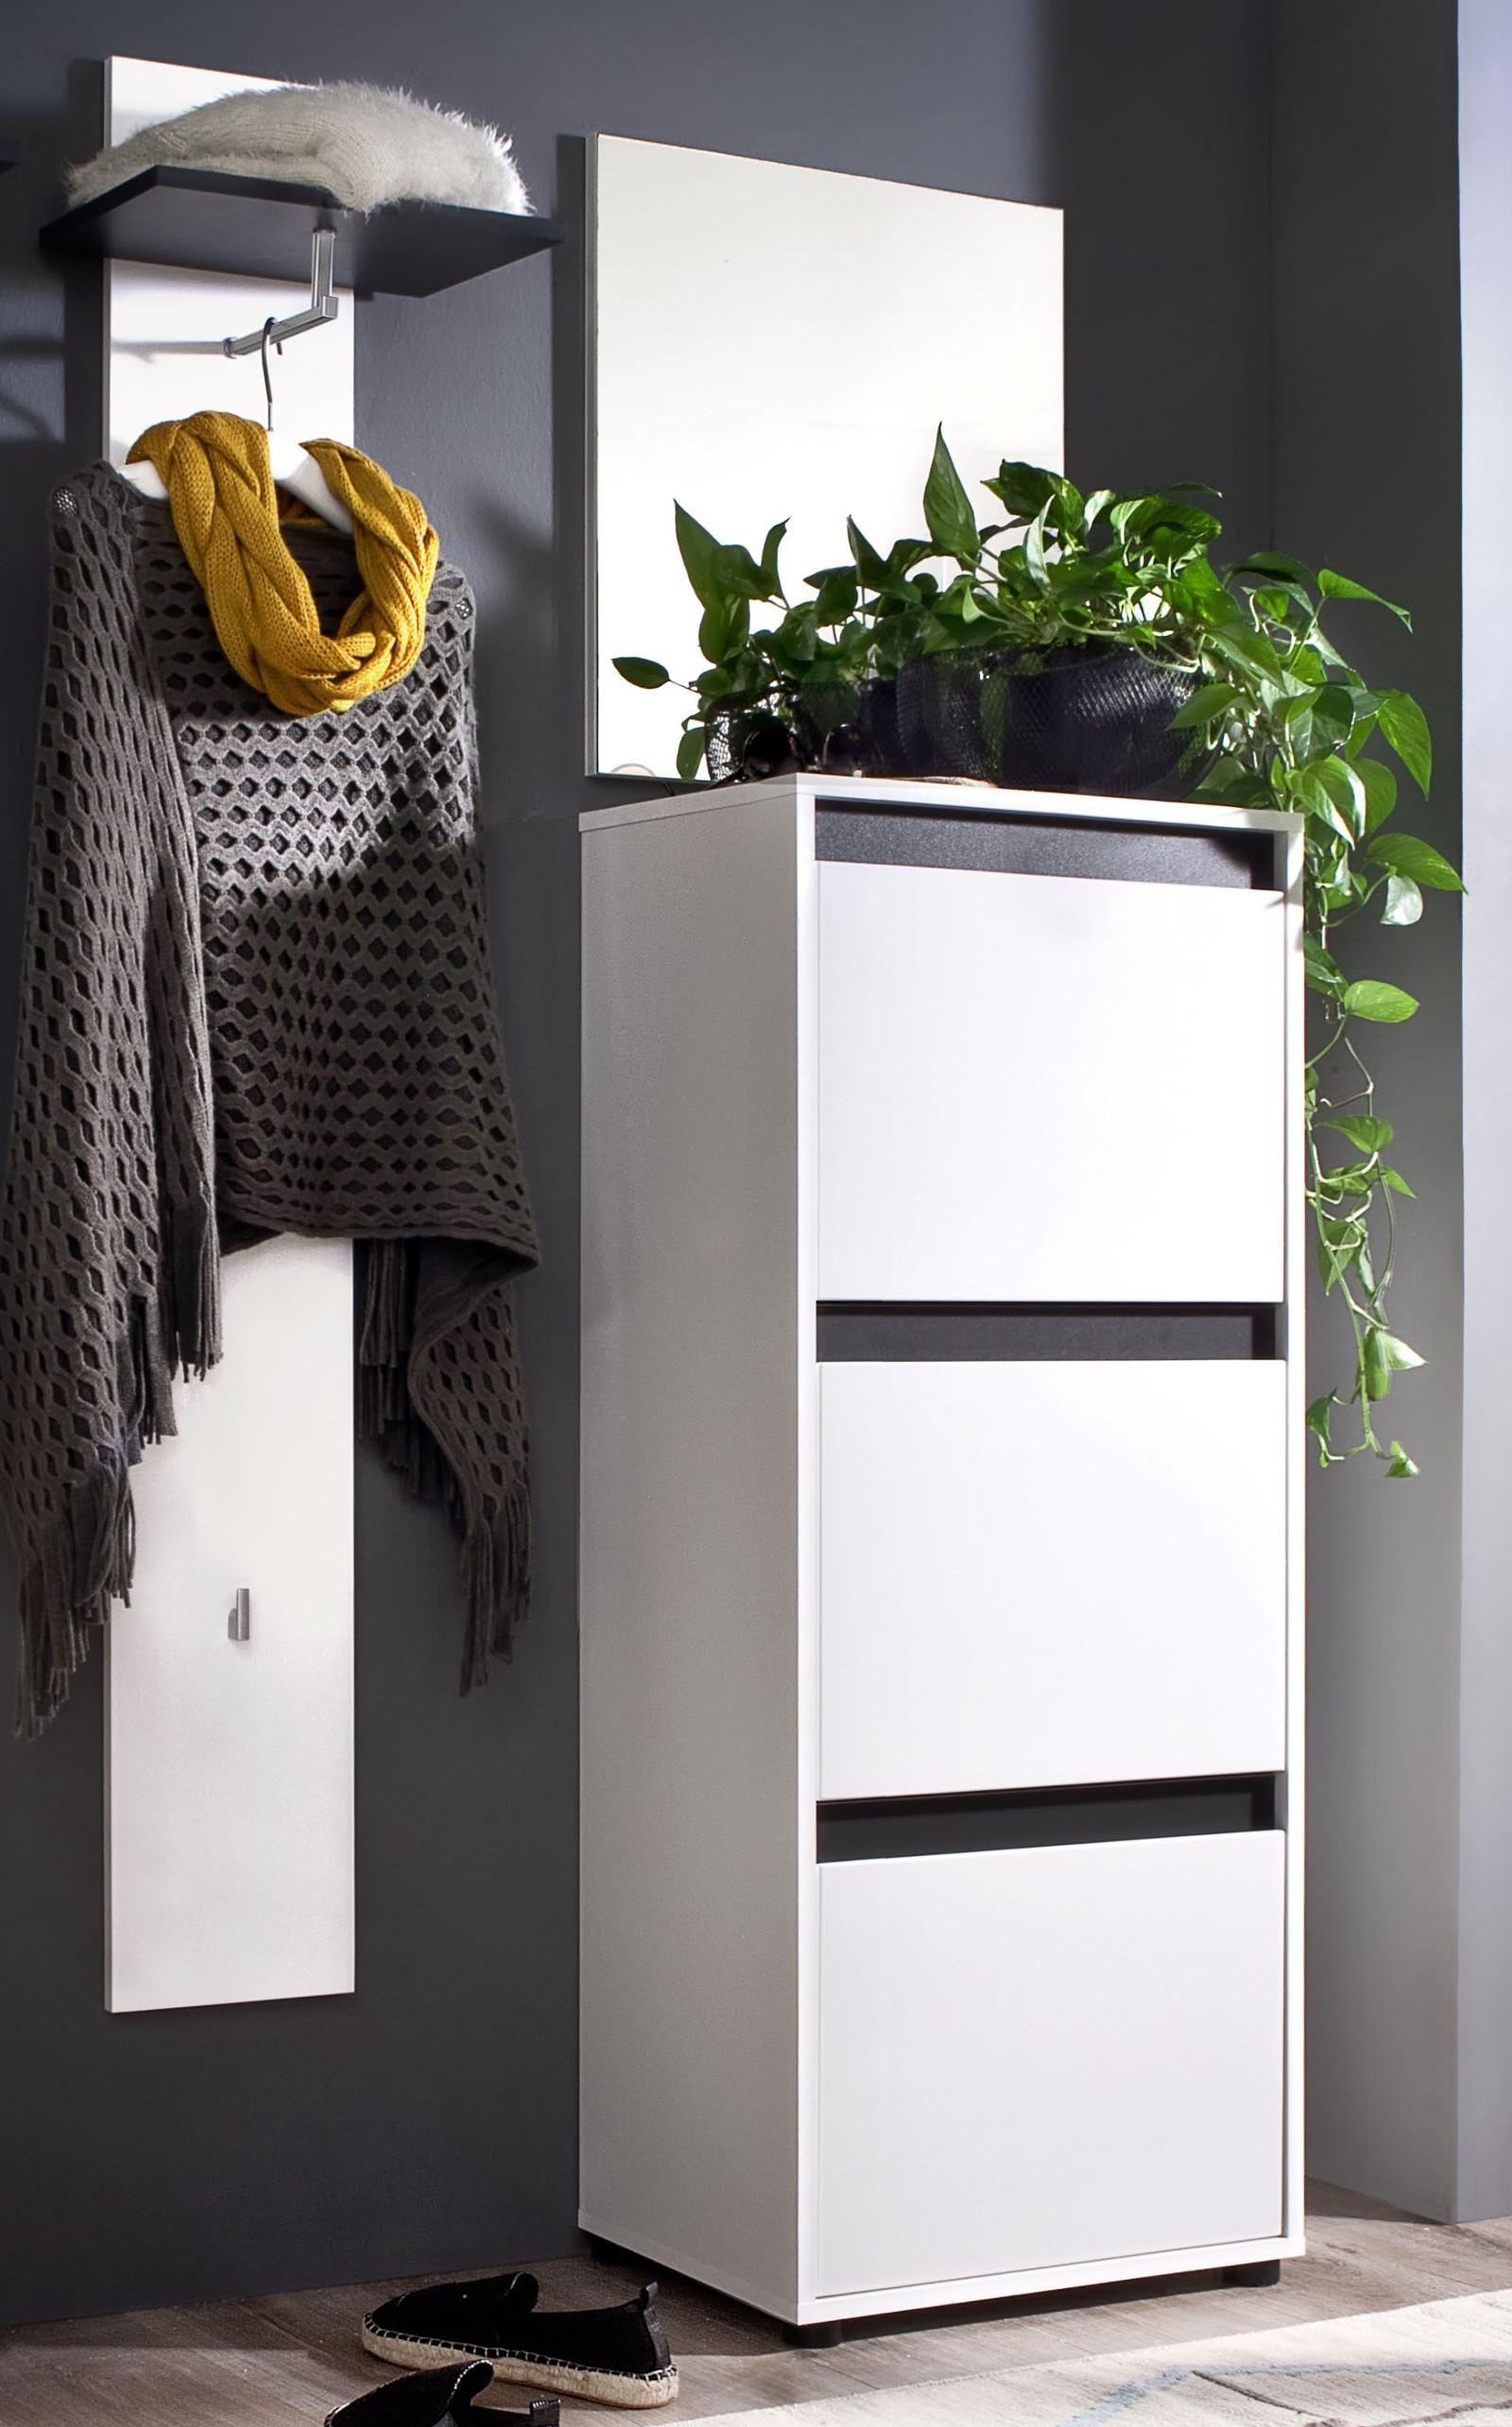 Wand garderobenpaneel sol lack hochglanz wei und grau for Garderobenpaneel grau